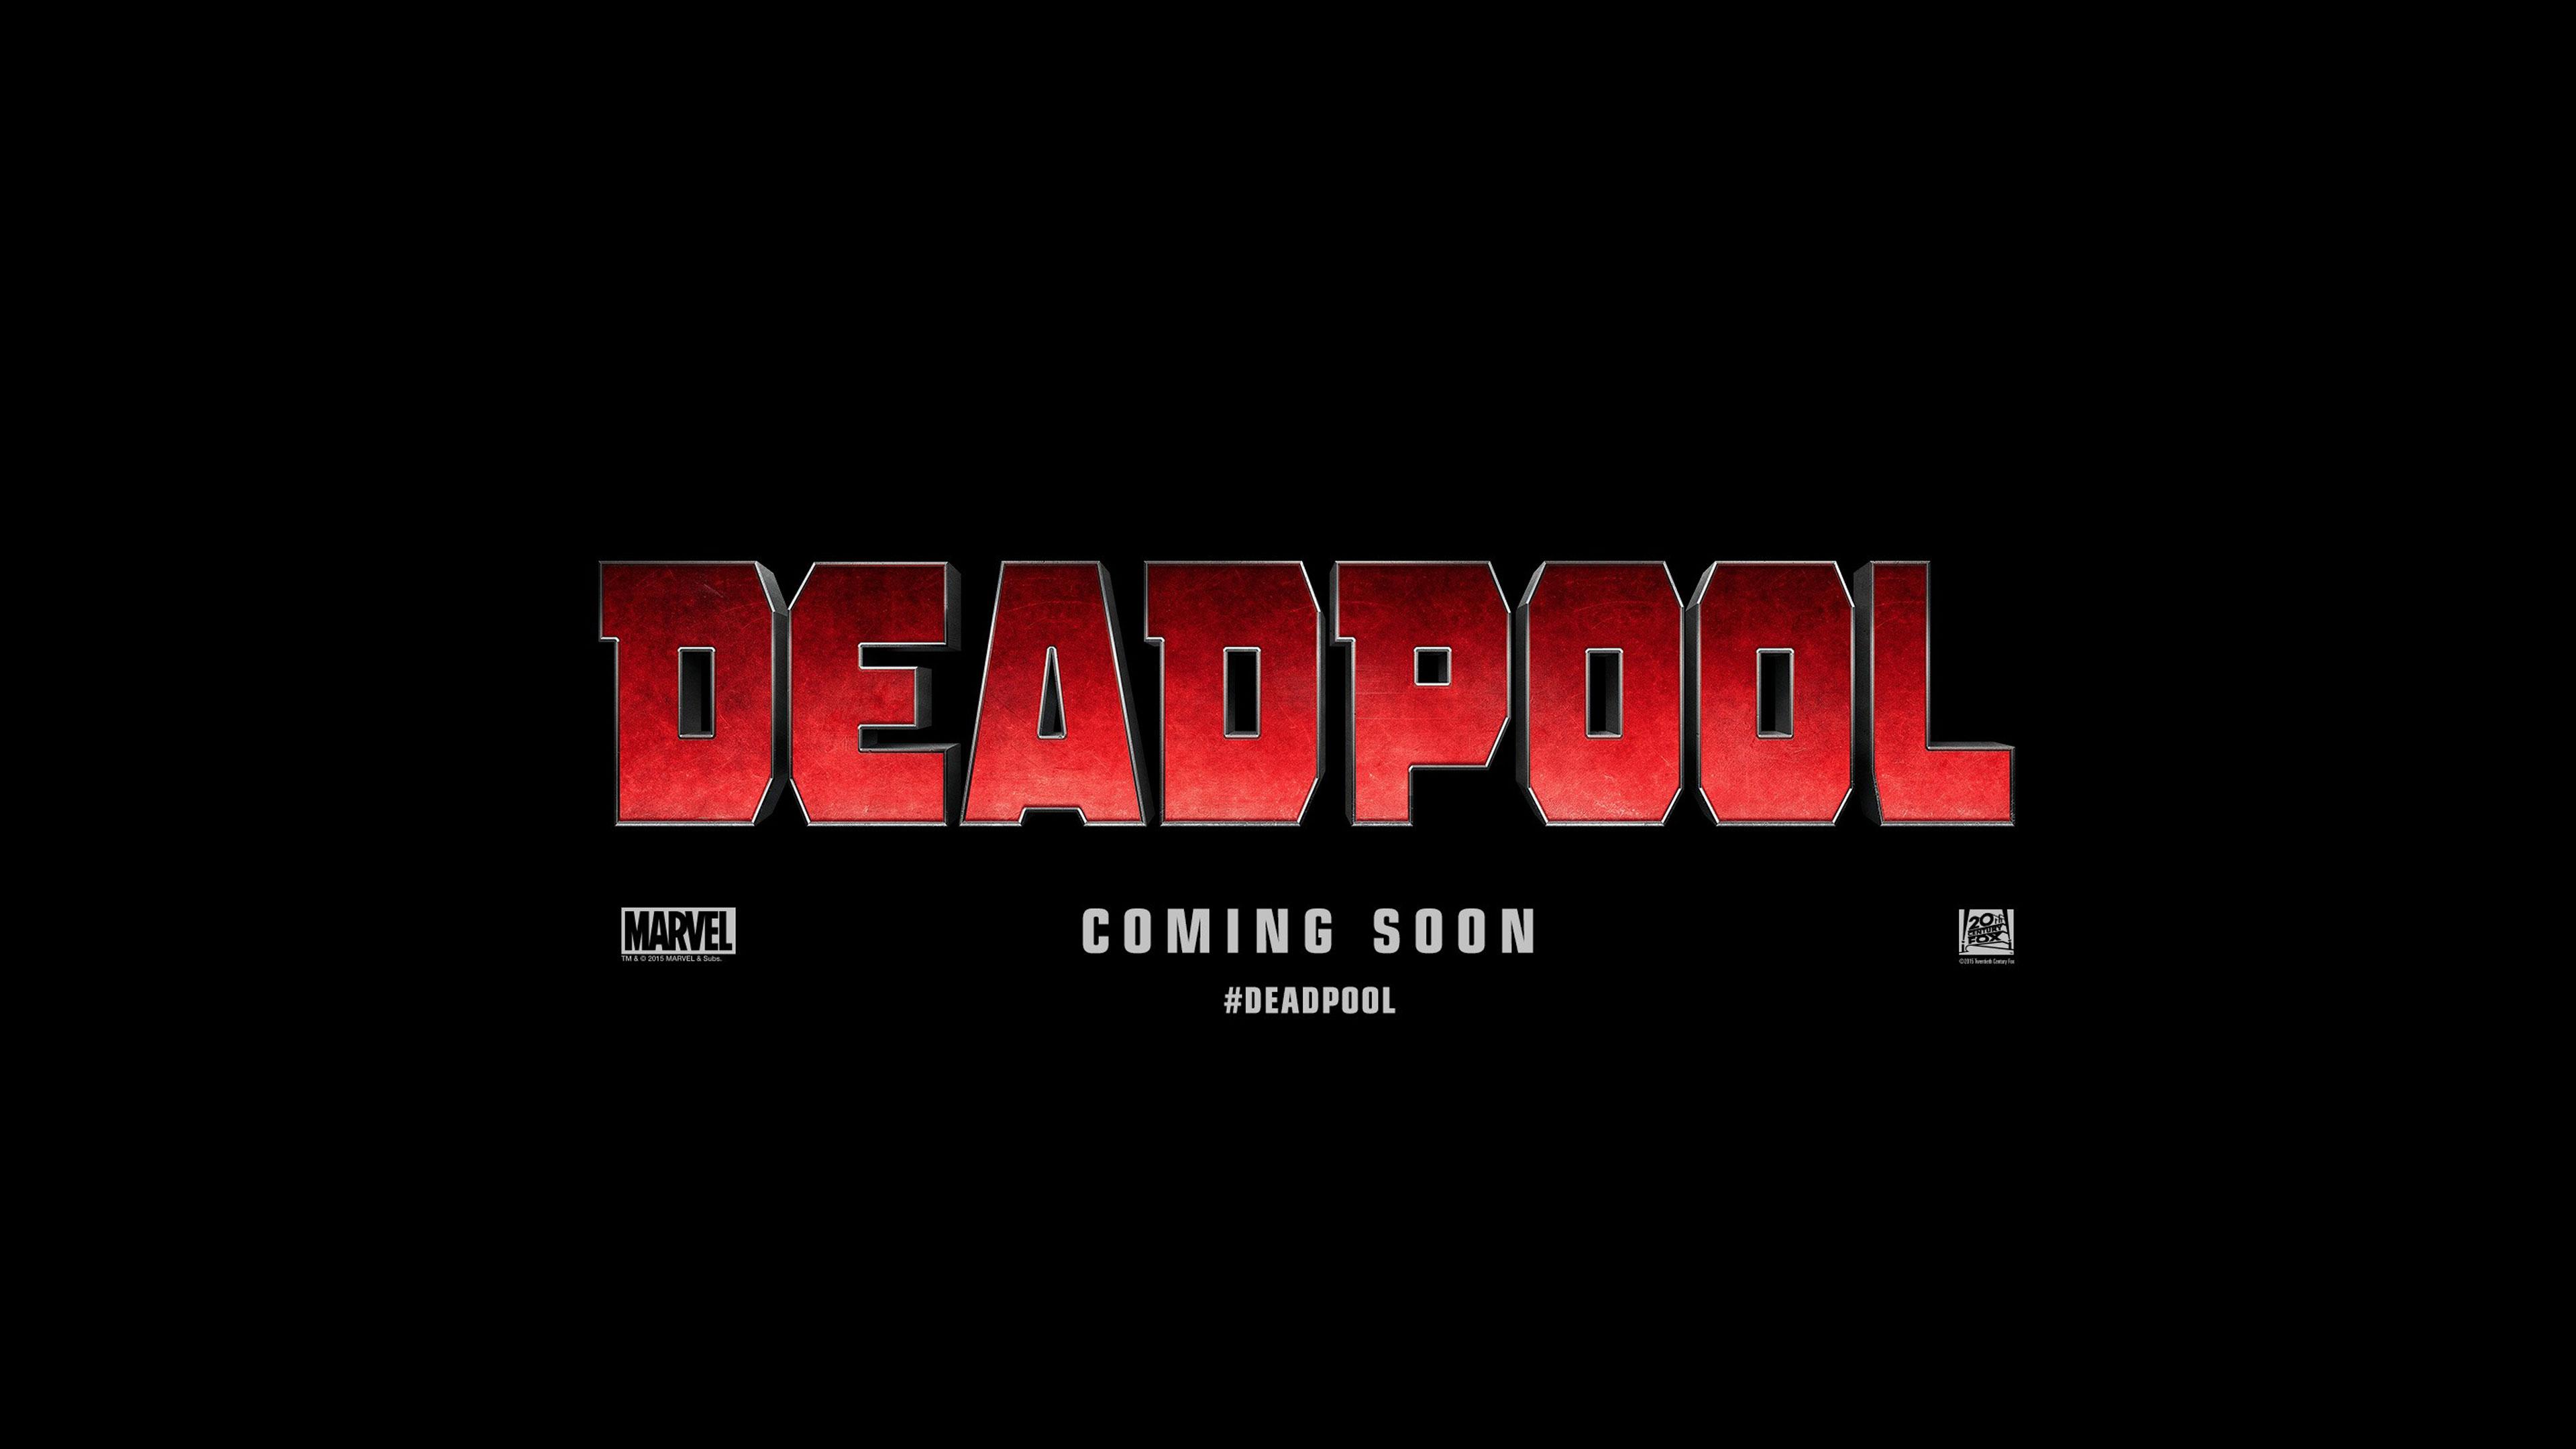 Deadpool 4K Logo - 3840x2160 - 4K 16/9 (Ultra HD, UHD) - Wallpaper